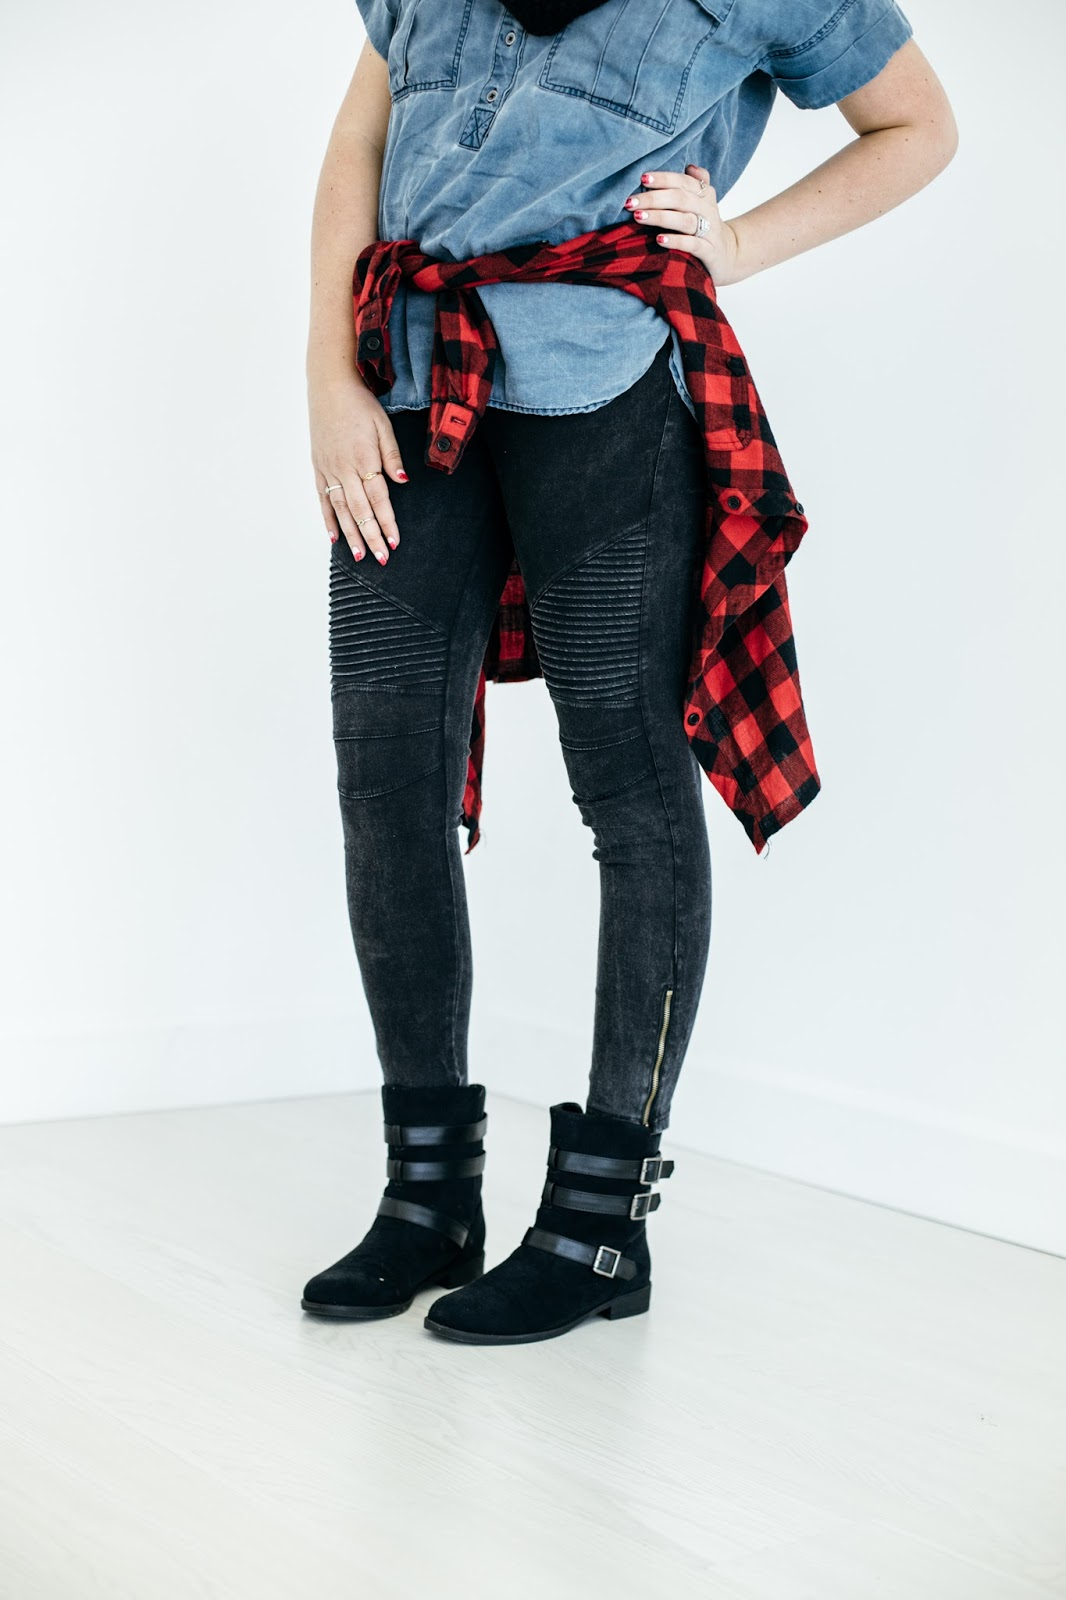 Moto Leggings, Buckle Boots, Utah Fashion Blogger